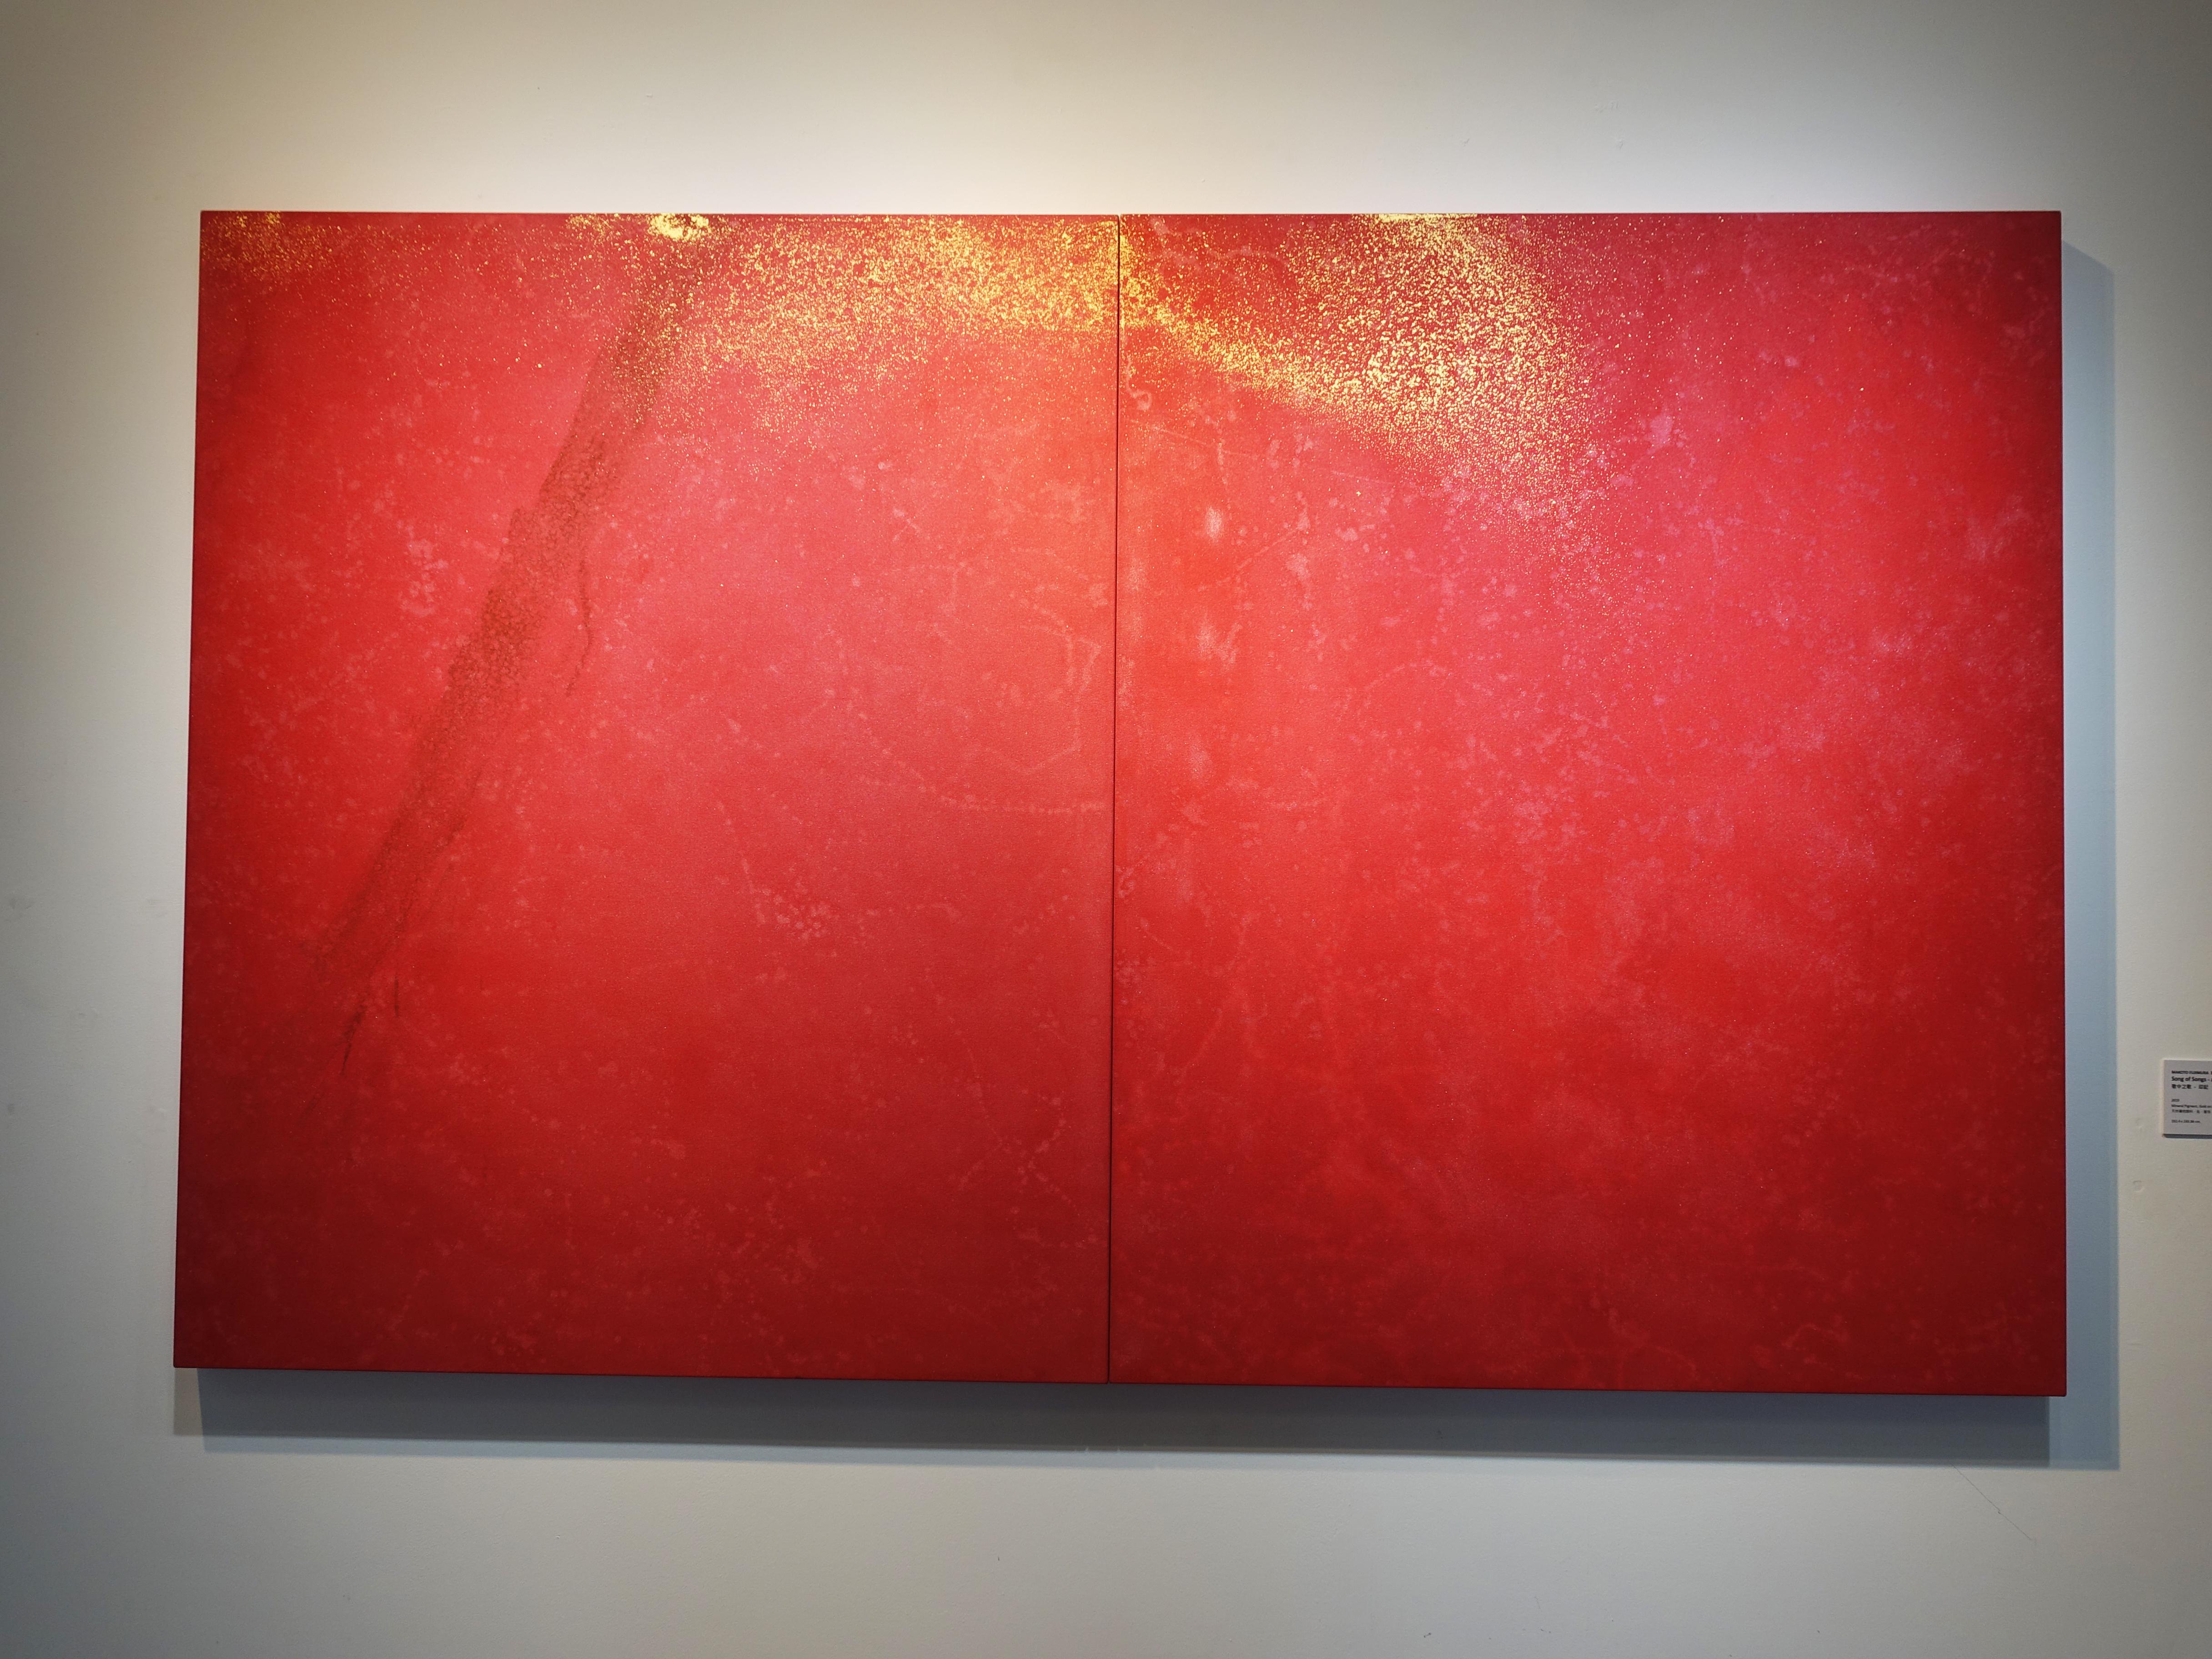 Makoto Fujimura,《Silence & Beauty - Cascade》,152.4 x 121.92 cm,天然礦物顏料、金、畫布,2018。